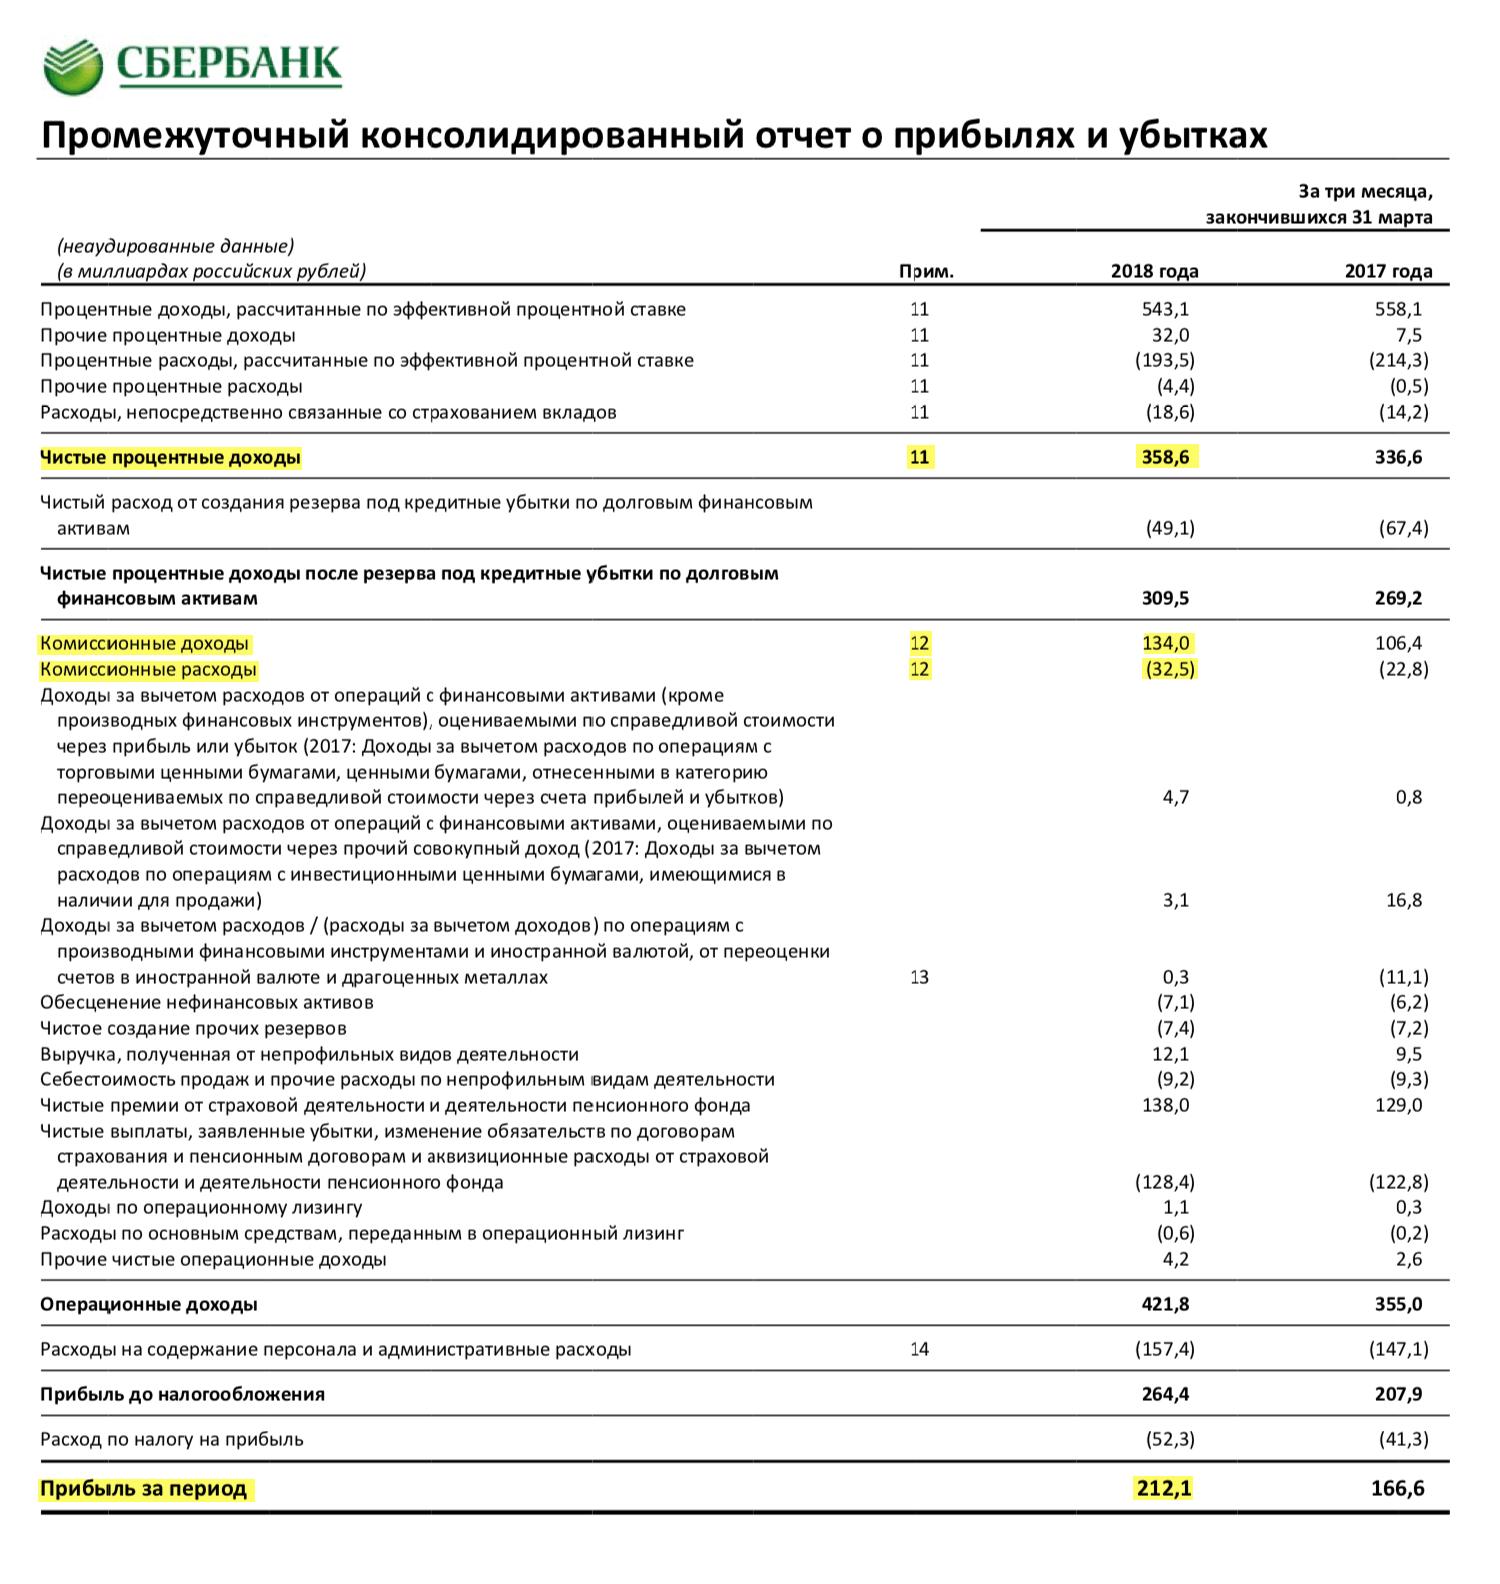 Страница 2 отчета Сбербанка за 1 квартал 2018 года